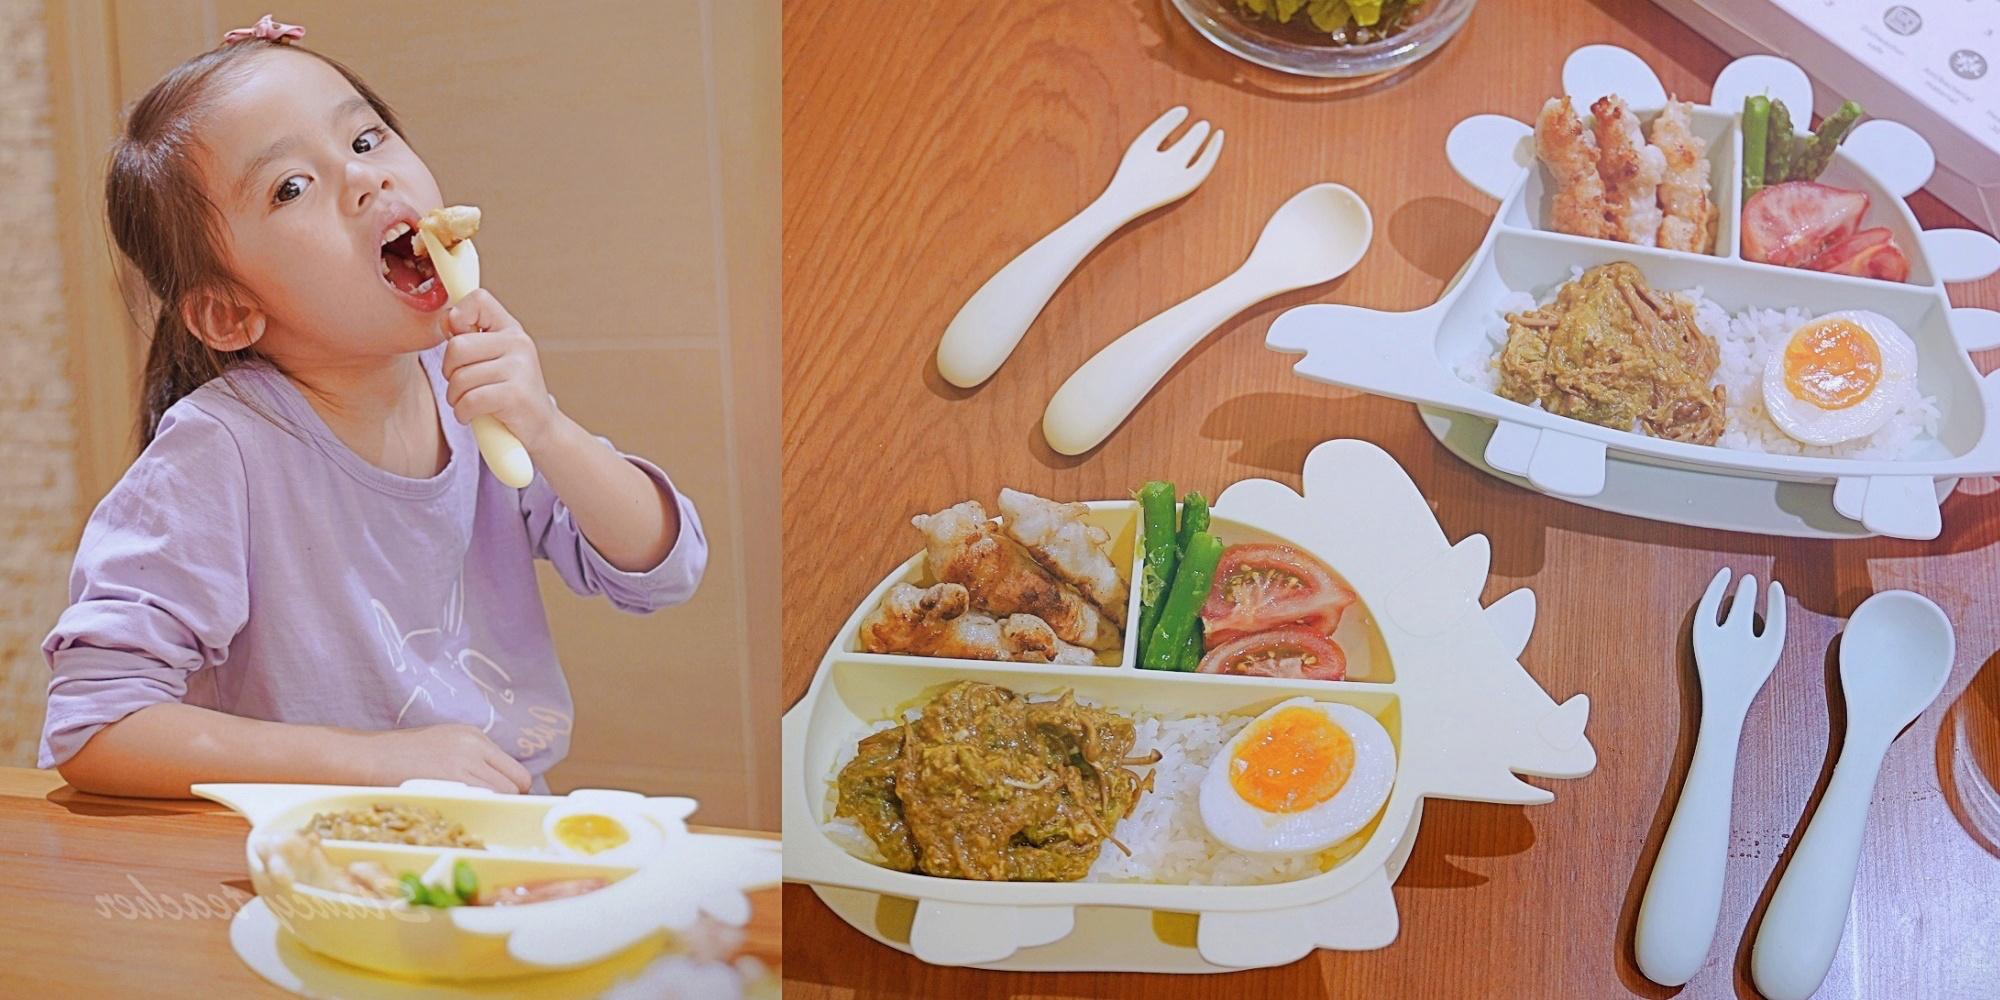 Besovida兒童矽膠餐具|Besovida 恐龍兒童學習餐盤|Besovida波波抗菌矽膠湯匙、安全叉子